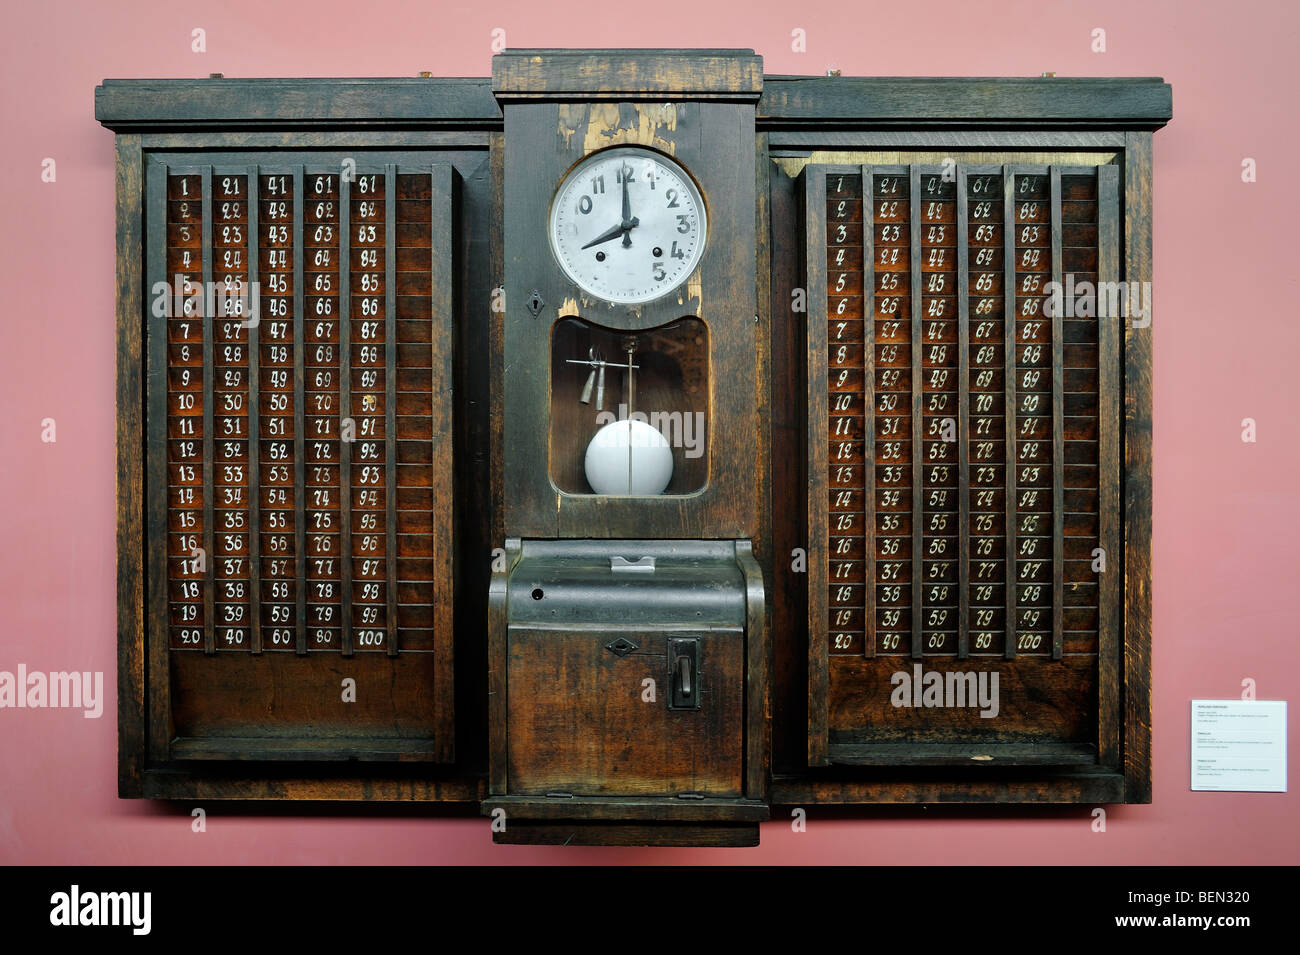 Antique time clock / punch clock at the Bois du Cazier coal mine museum, Marcinelle, Charleroi, Belgium Stock Photo